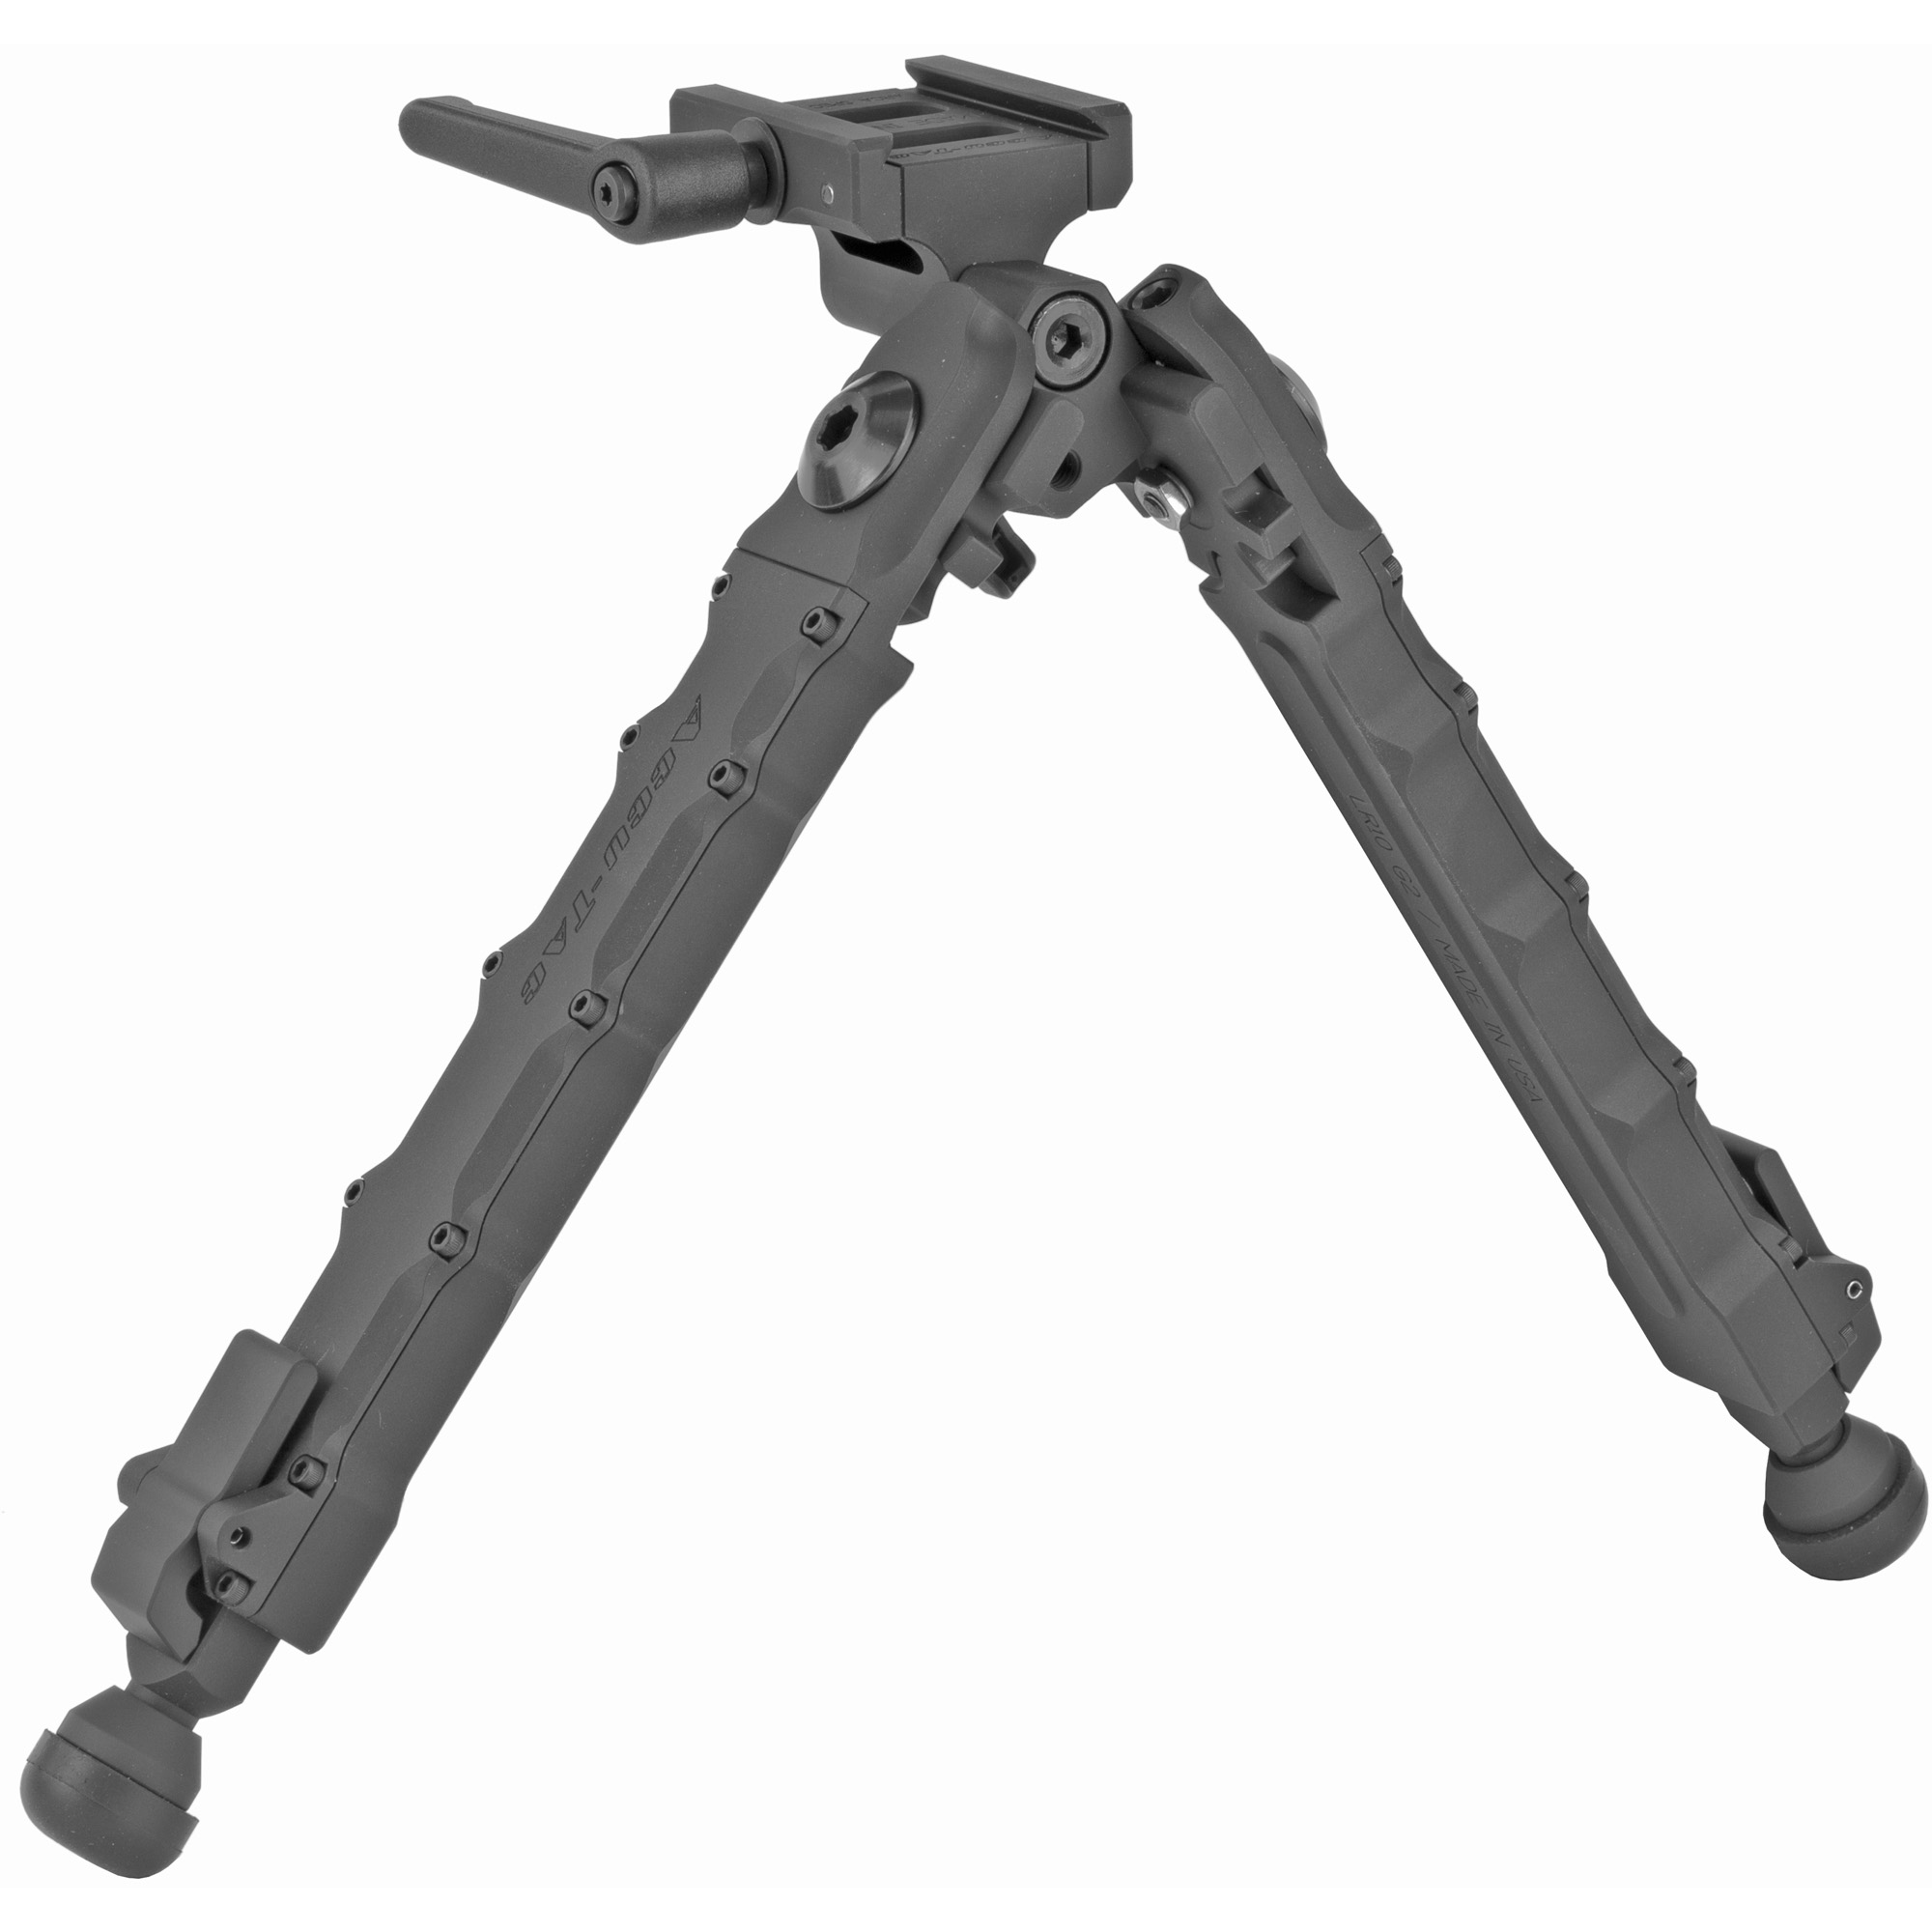 Accu-tac Lr-10 G2 Arca Spec